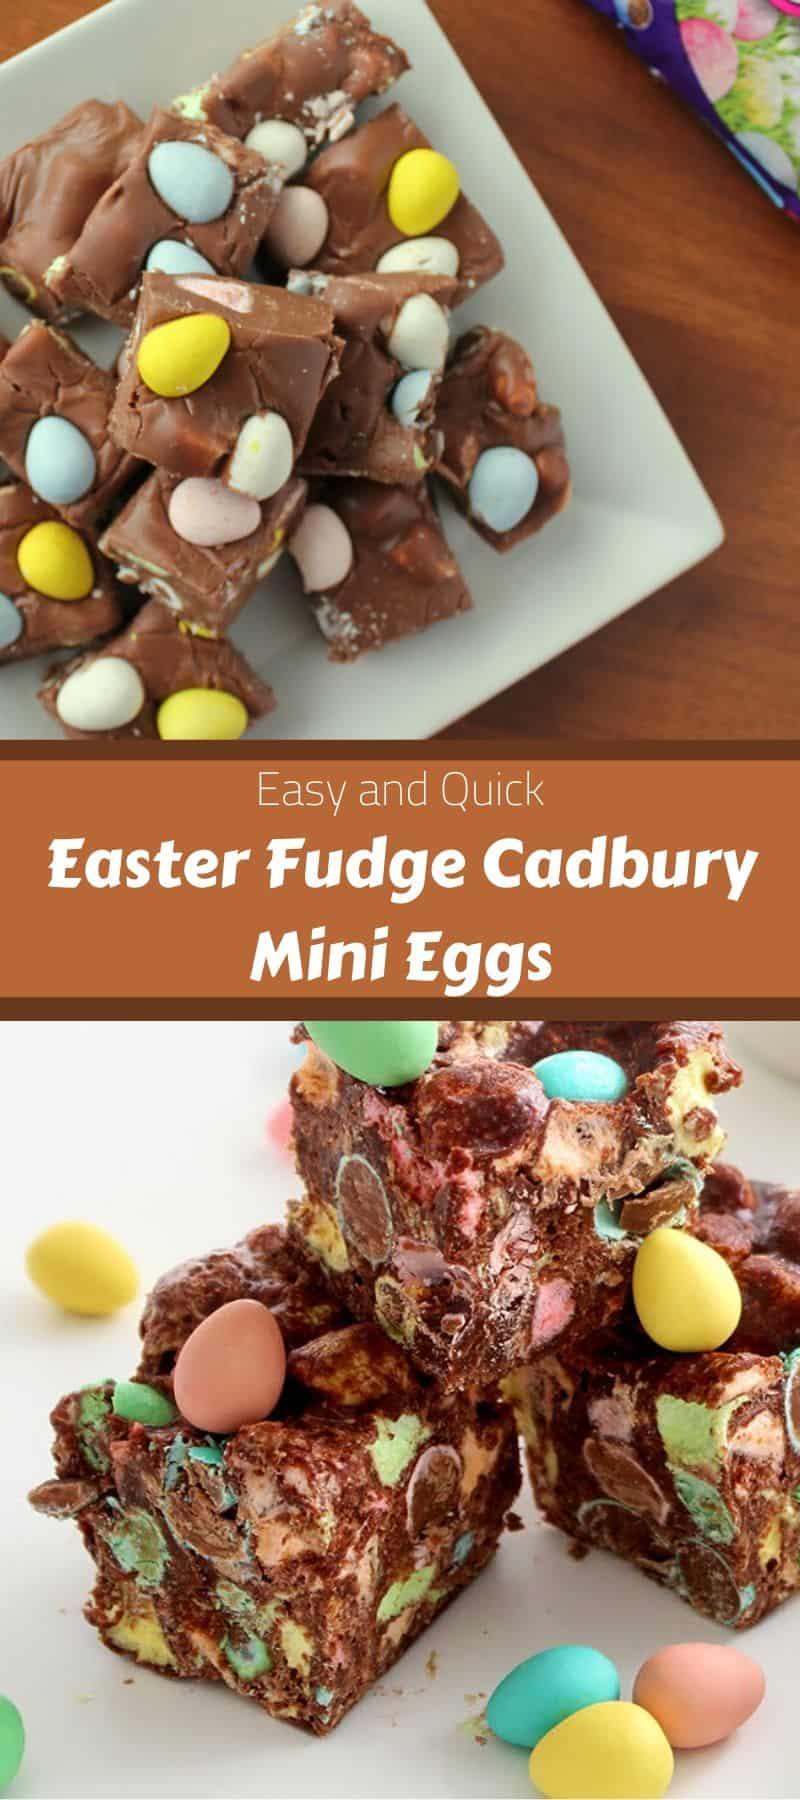 Easy Easter Fudge Cadbury Mini Eggs 3